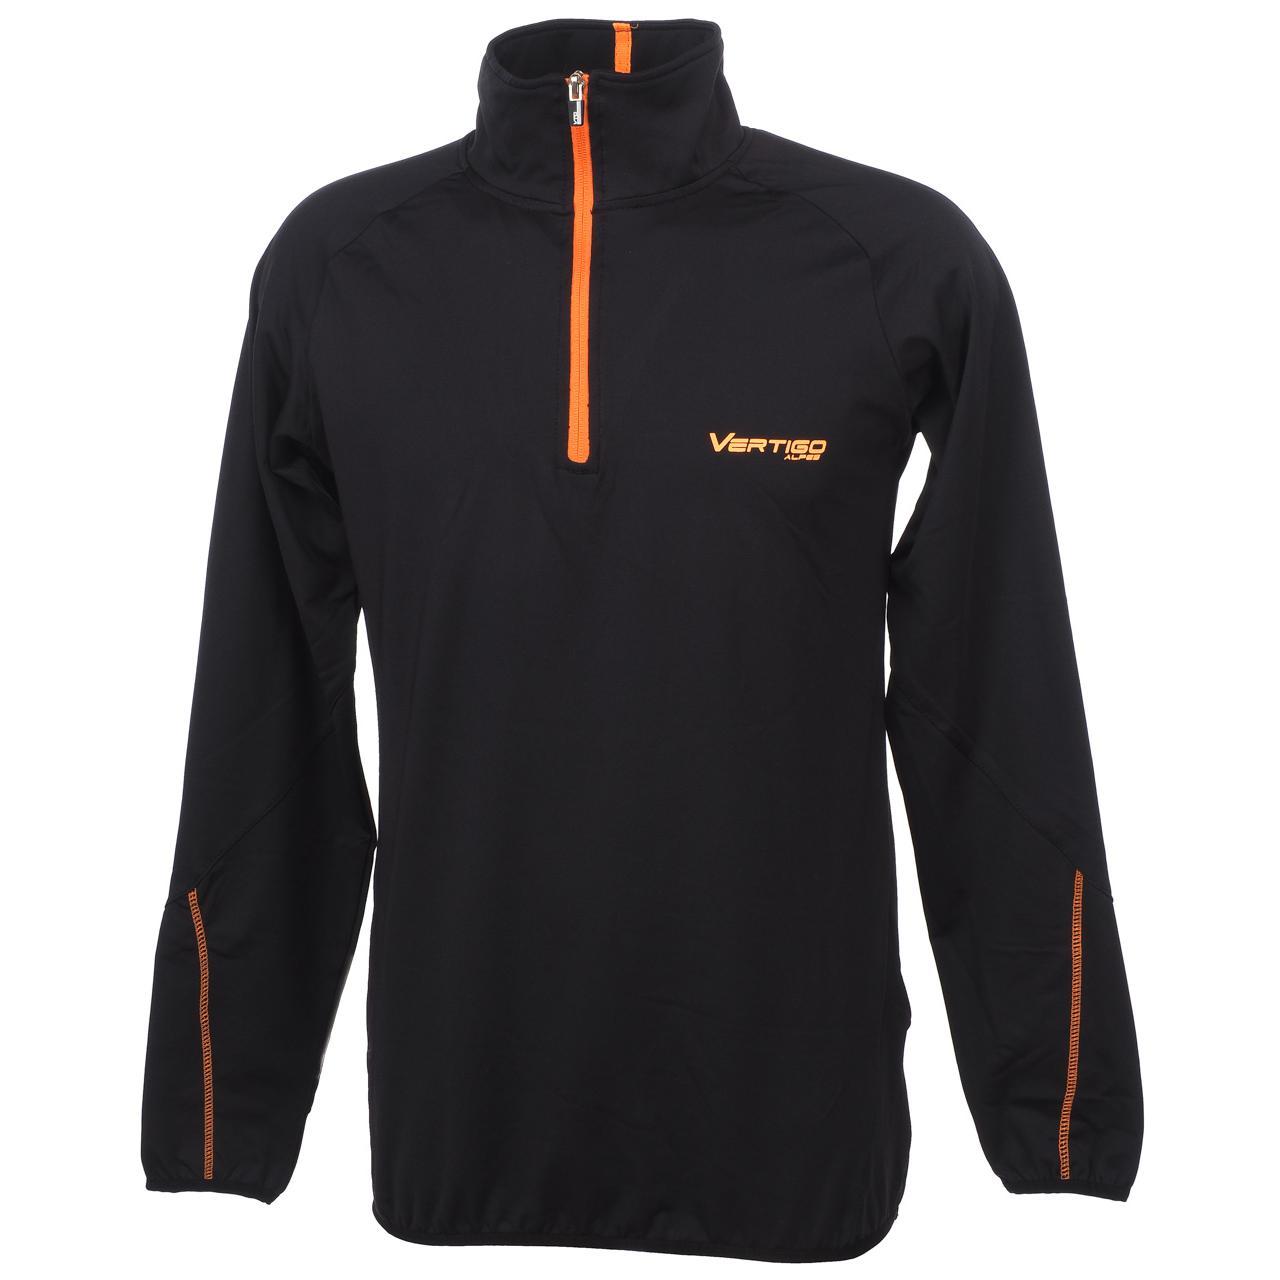 Under-Clothing-Thermal-Hot-Alpes-Vertigo-Manu-Blk-1-2z-ML-Tee-Poly-Black-251